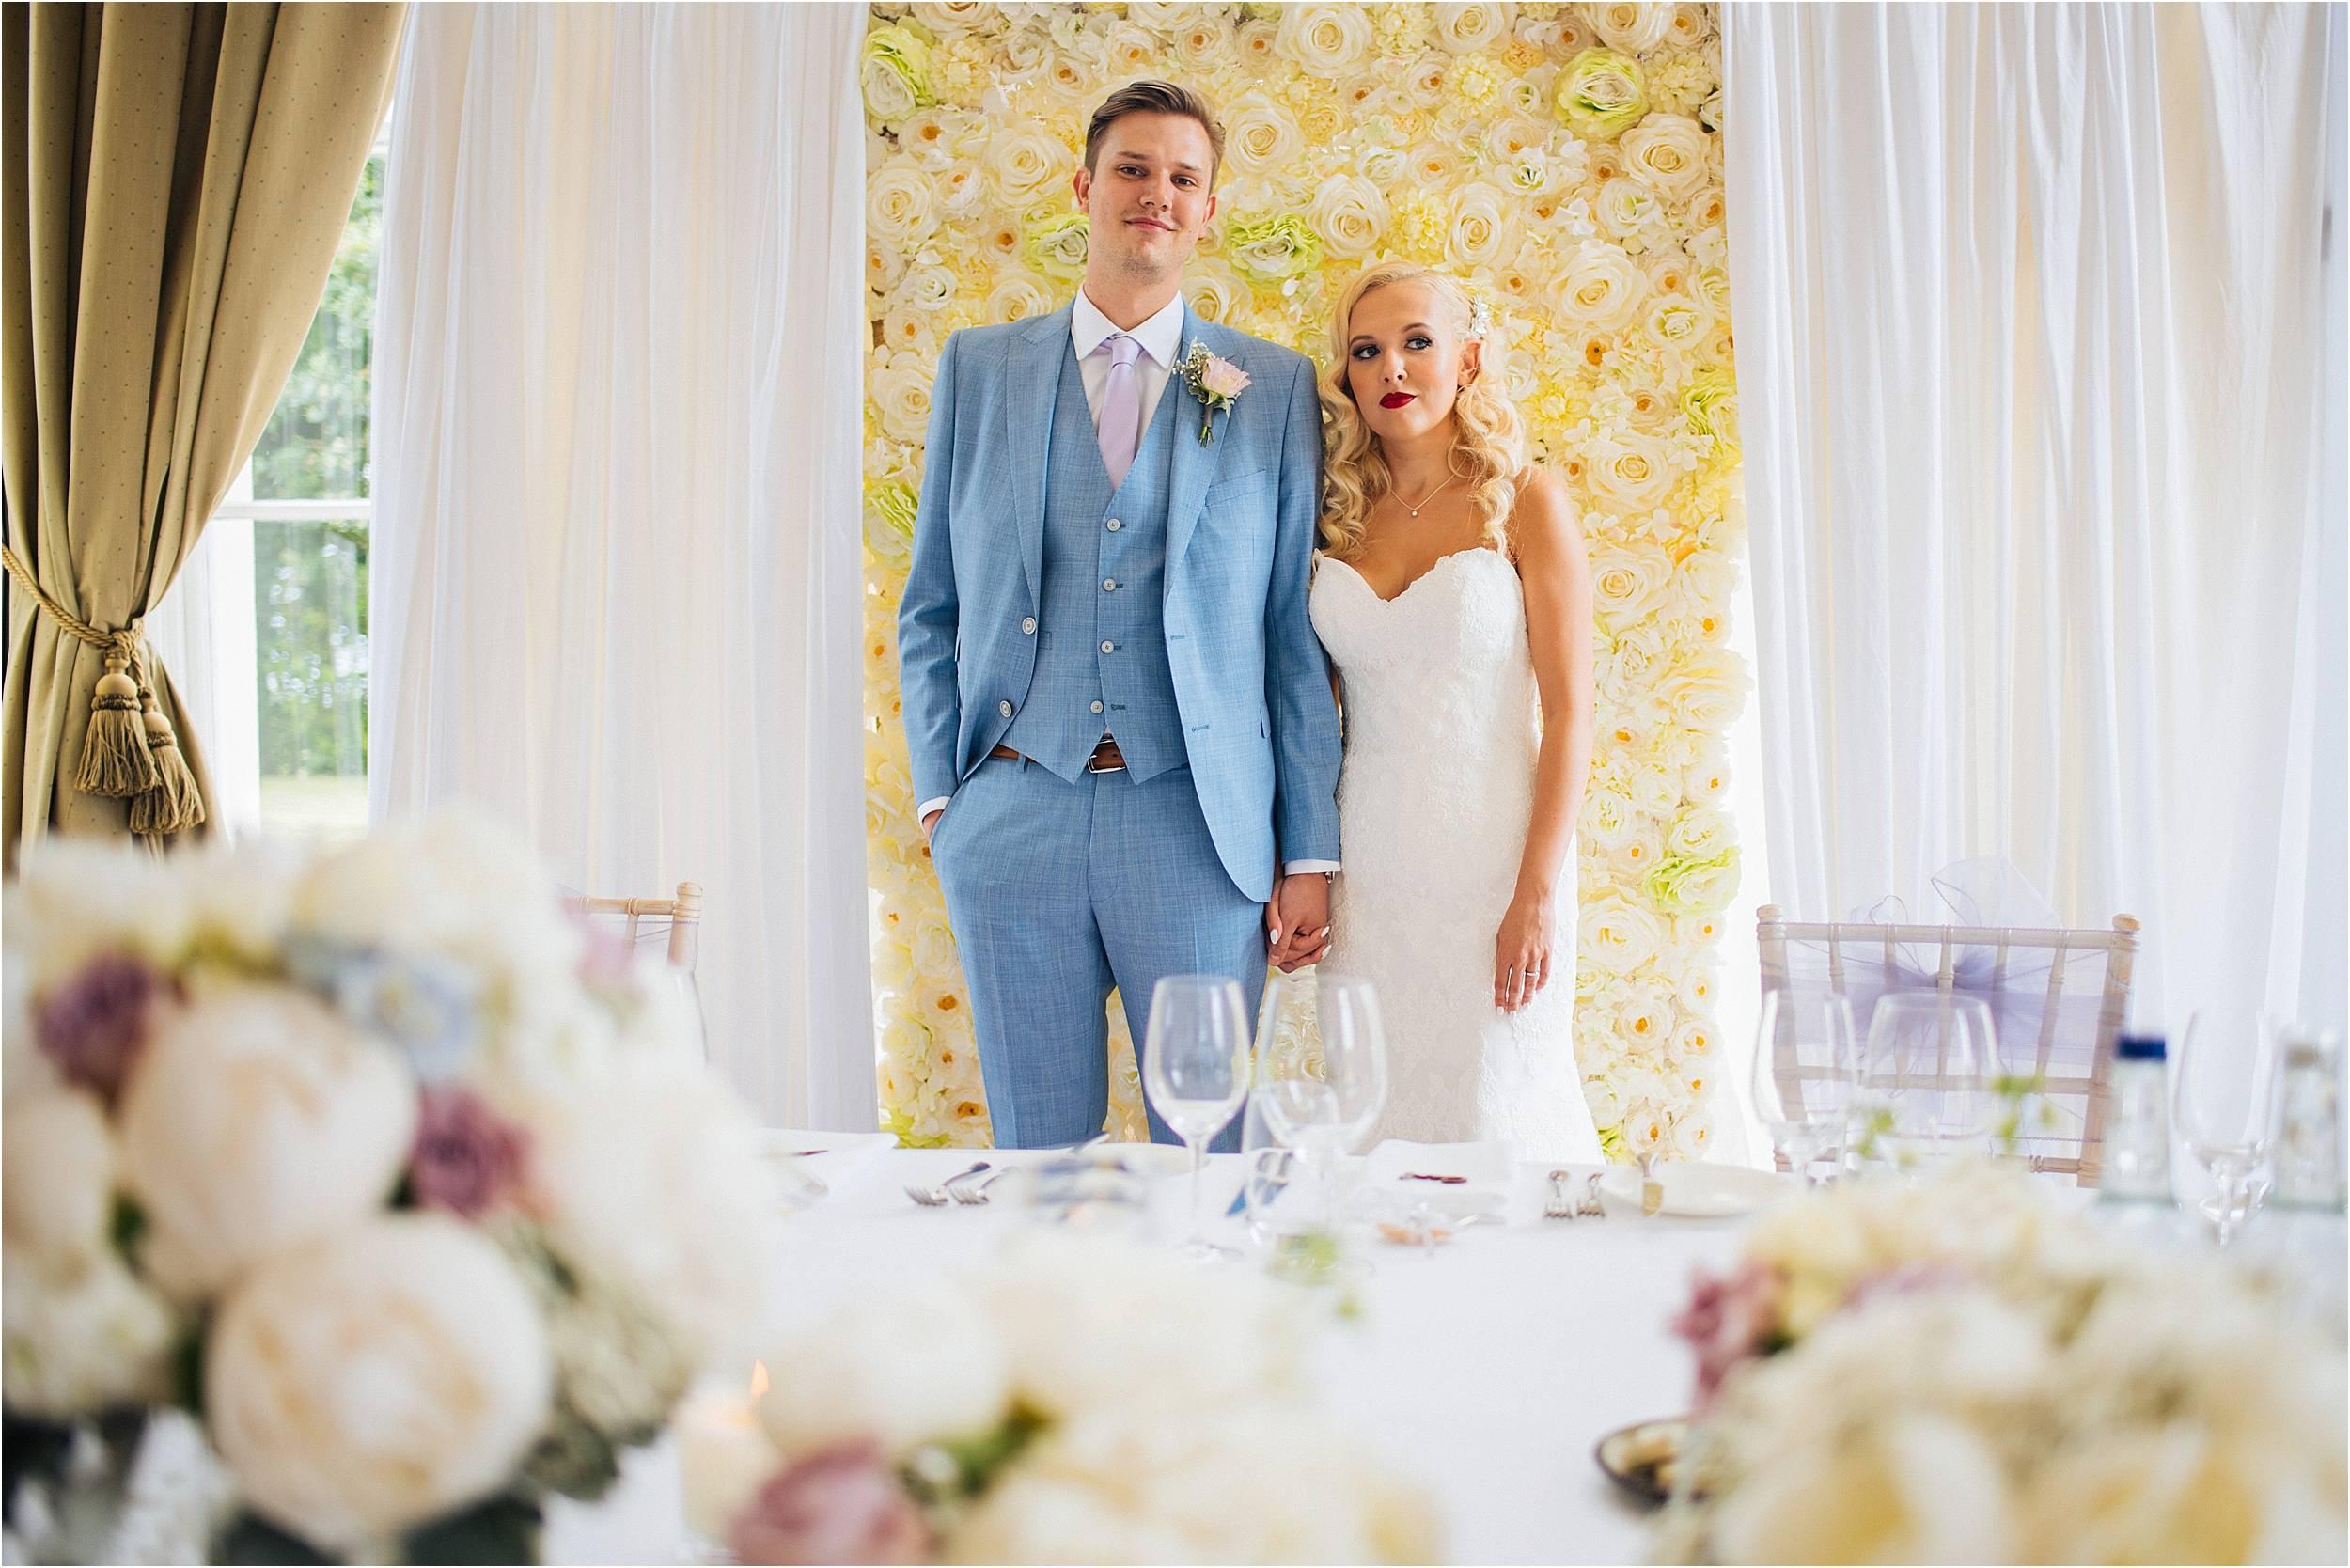 Seaham Hall Wedding Photography_0052.jpg